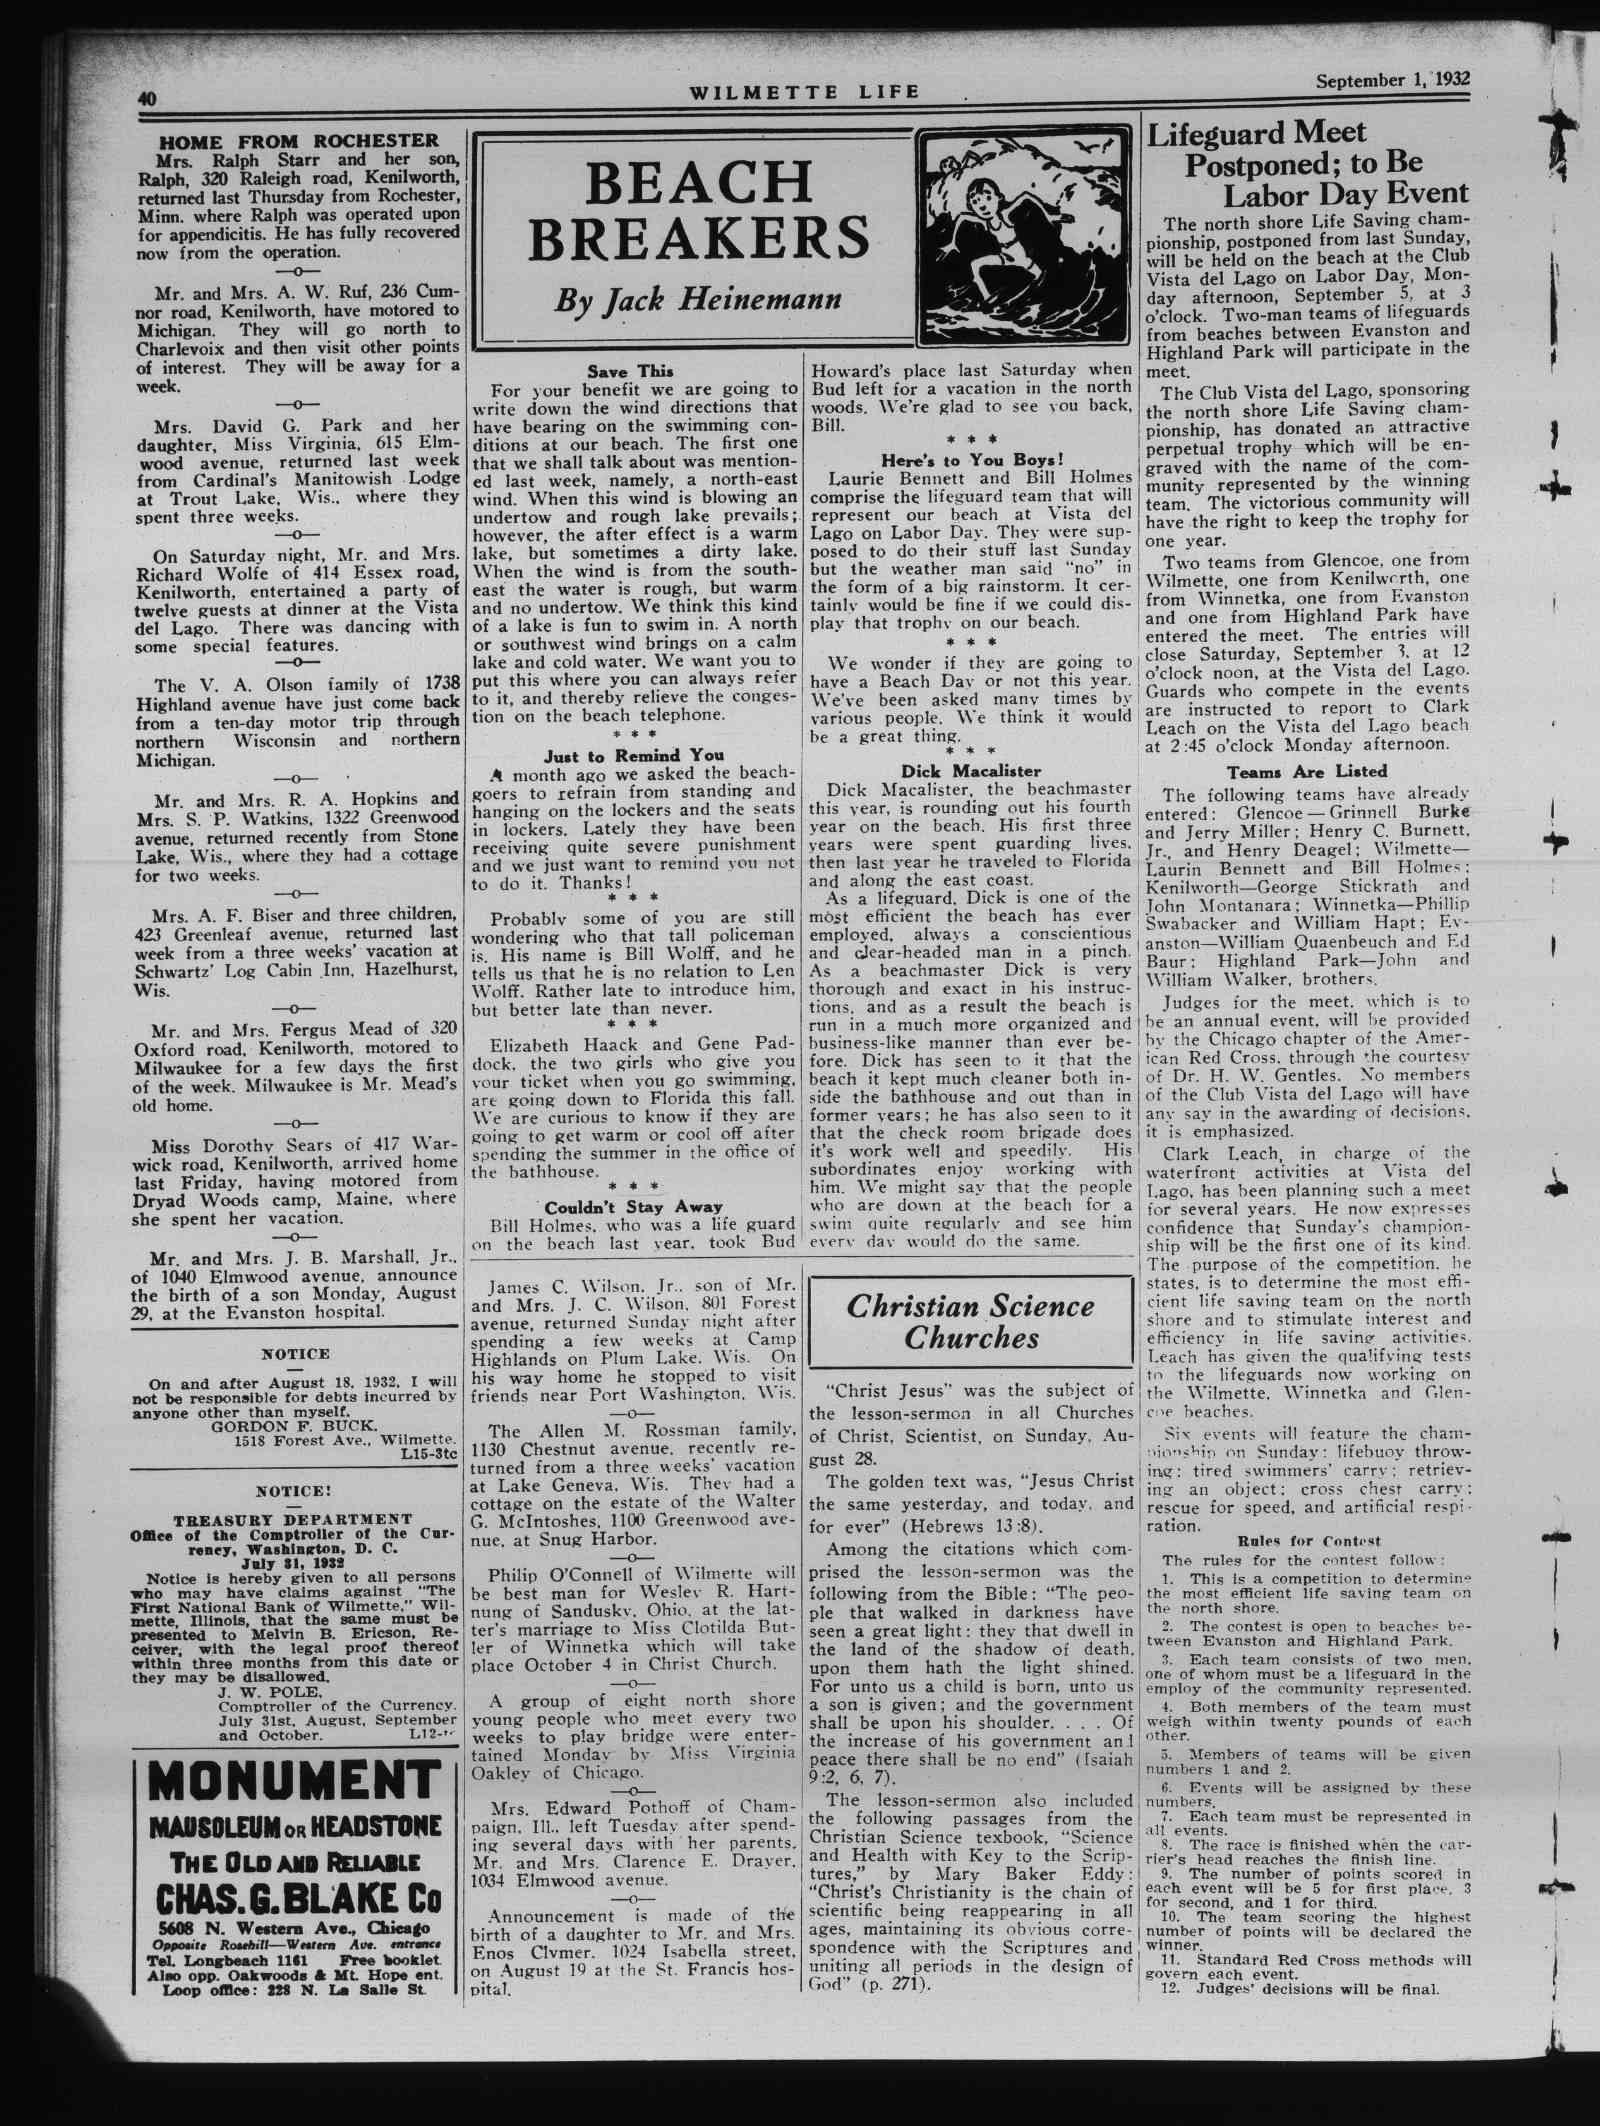 Wilmette Life (Wilmette, Illinois), 1 Sep 1932